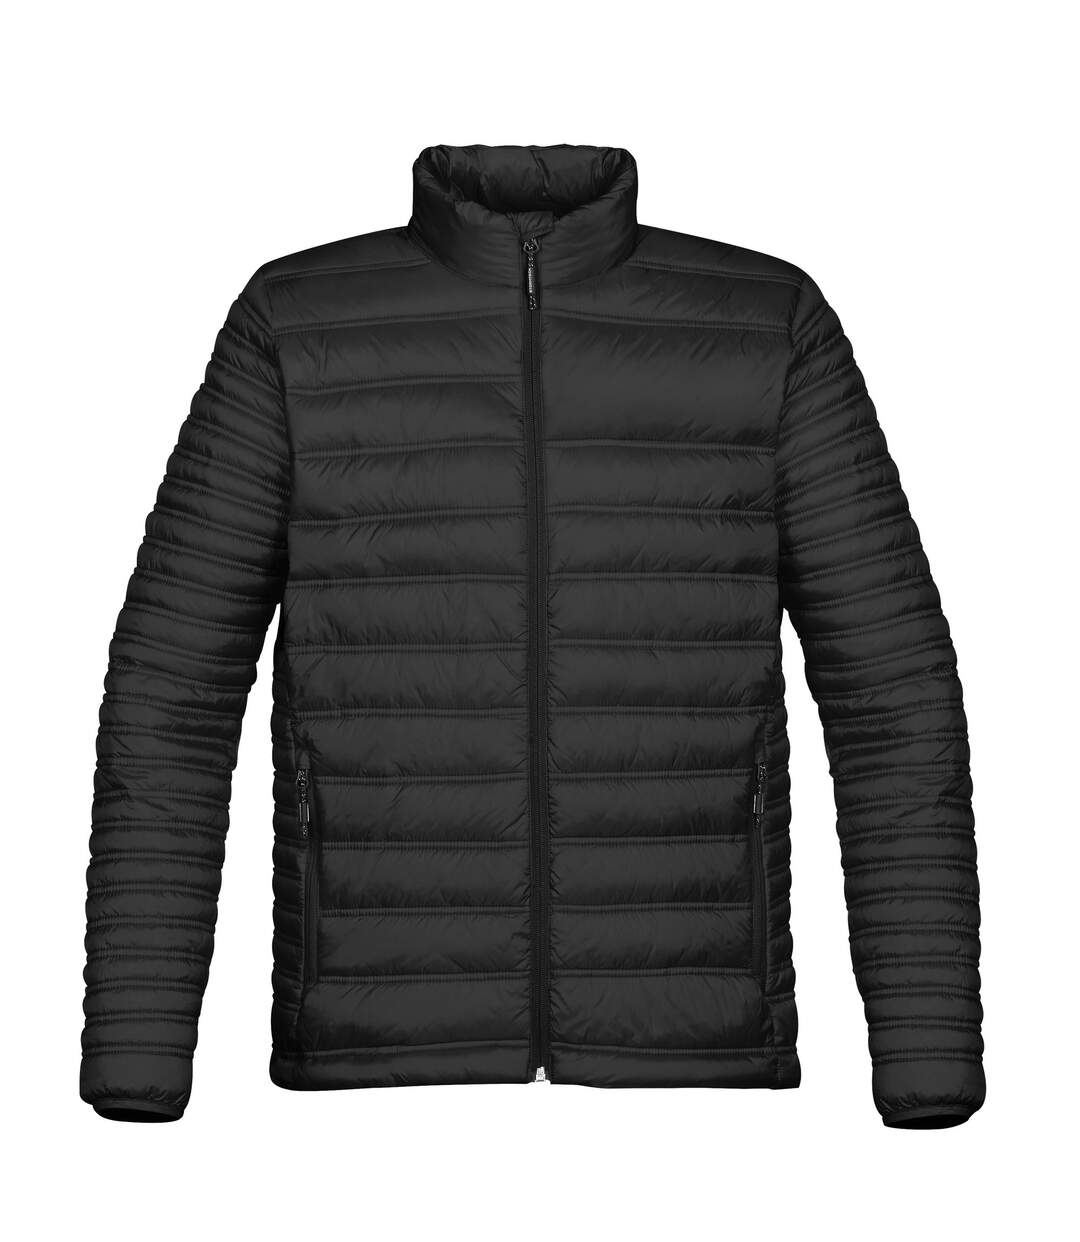 Stormtech Mens Basecamp Thermal Quilted Jacket (Black) - UTRW4784